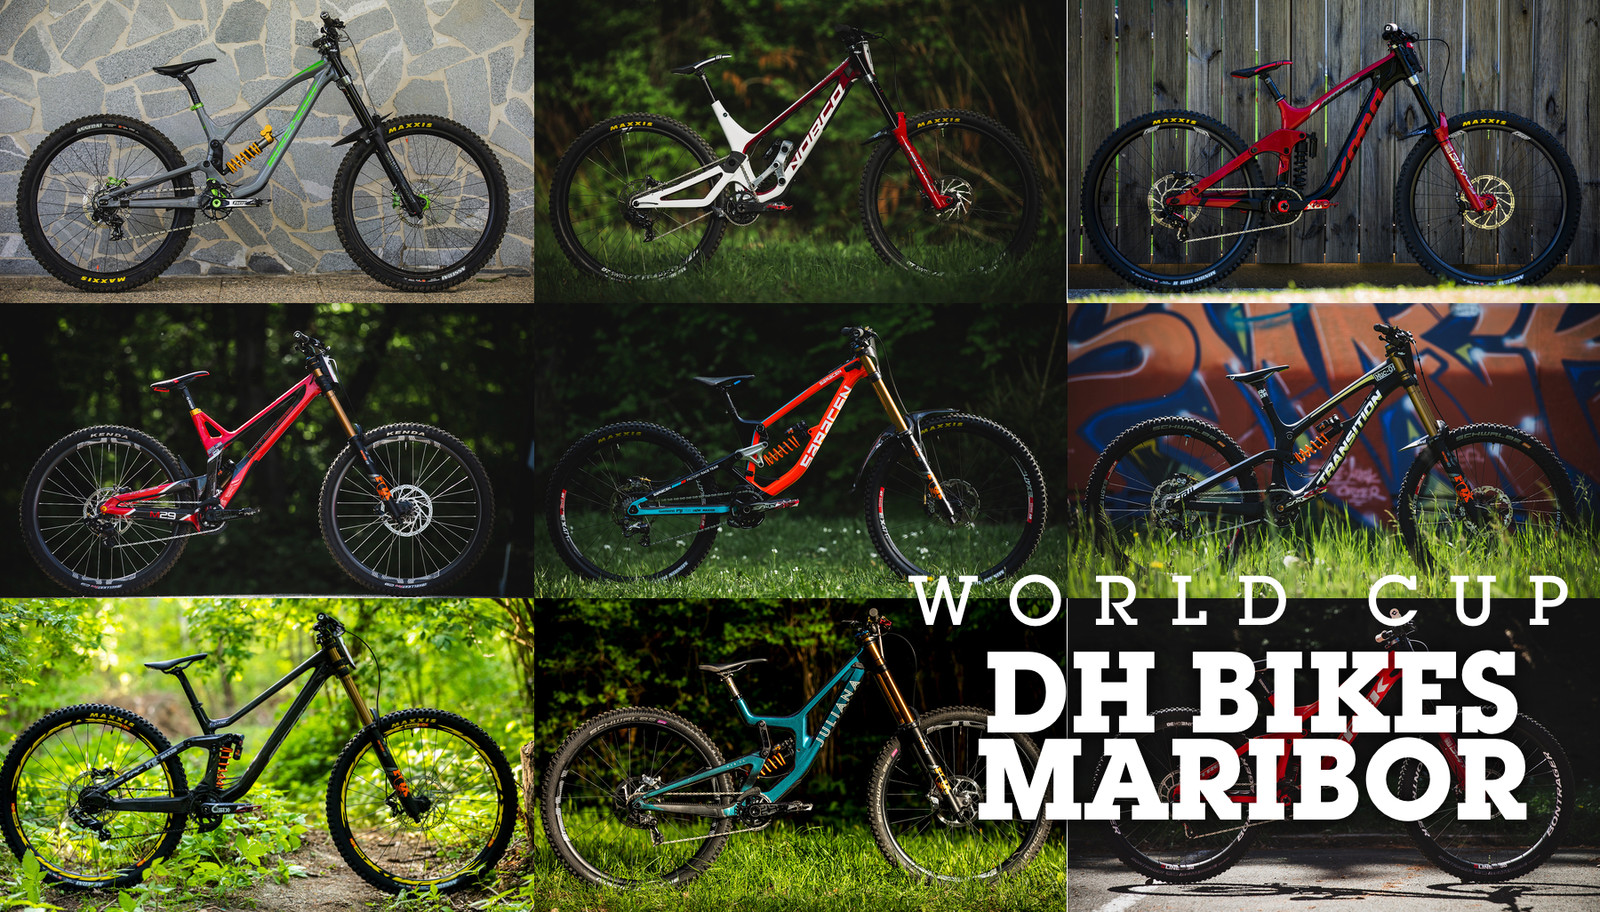 WORLD CUP DH BIKES - Maribor